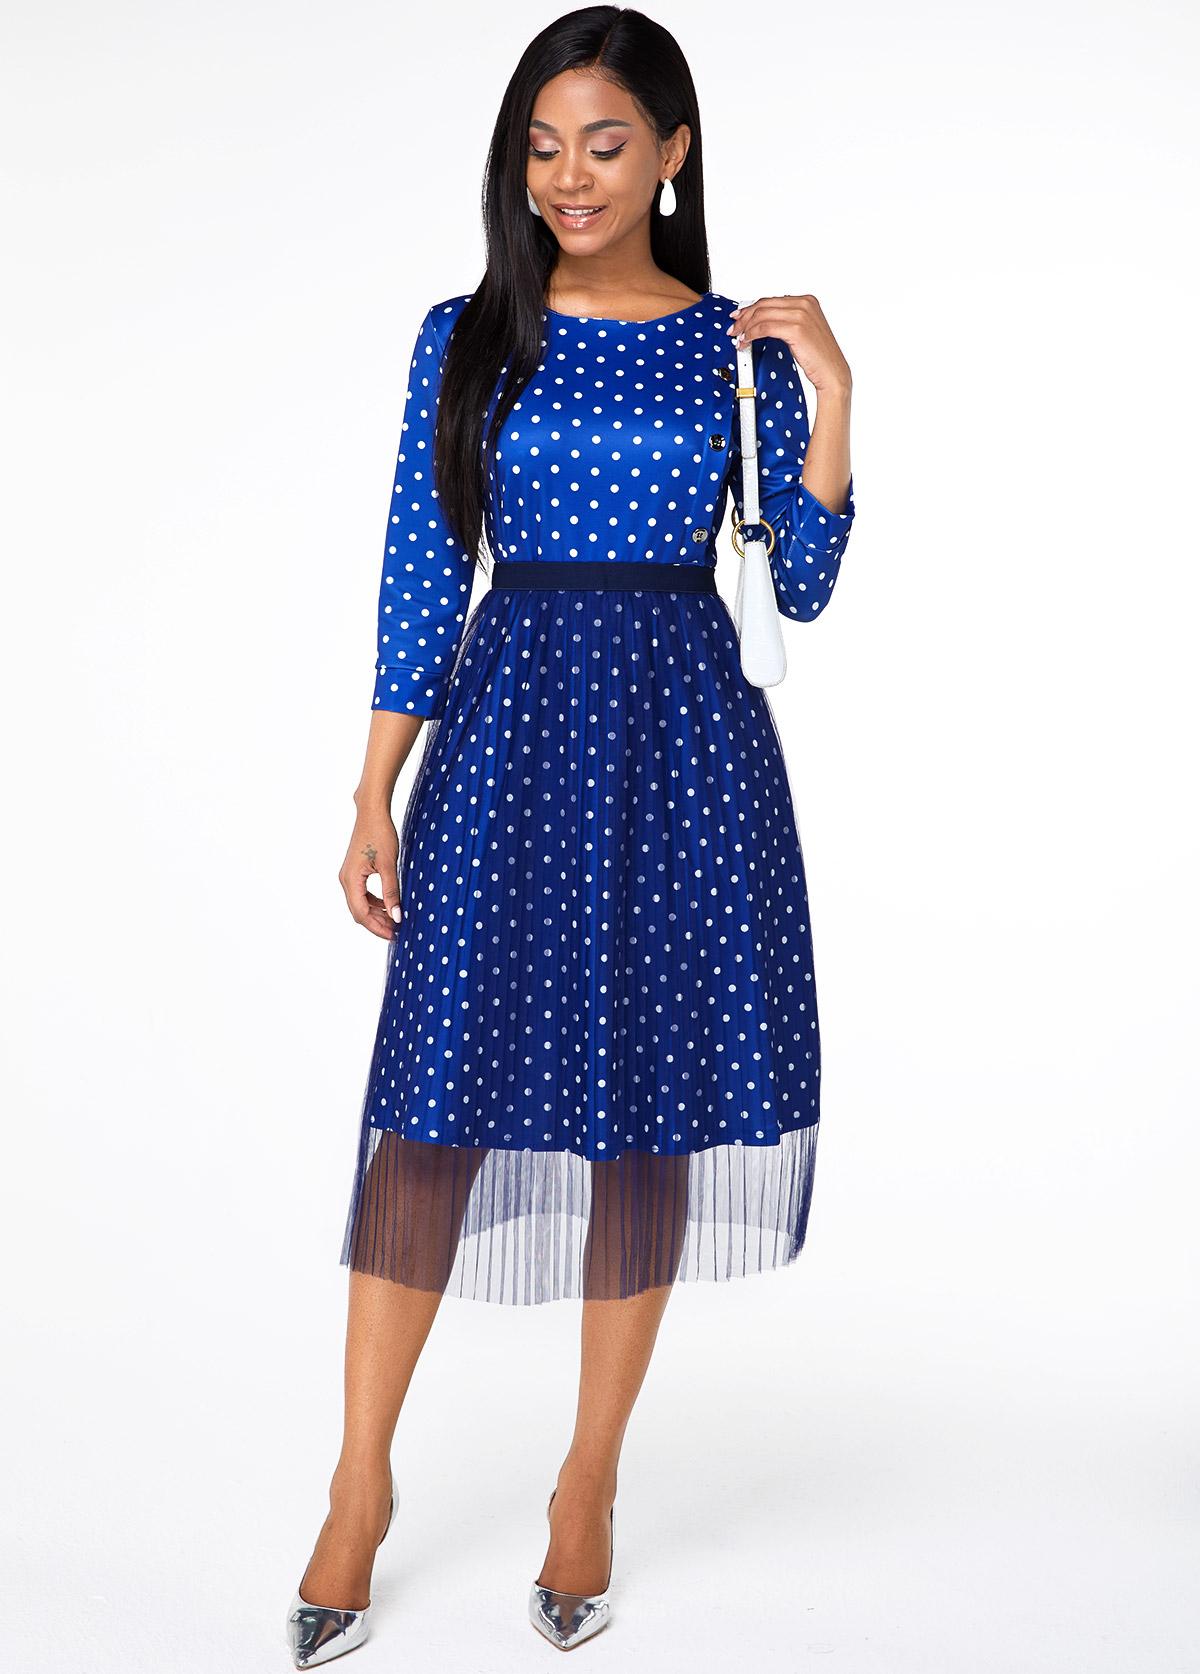 Round Neck Button Detail Polka Dot Dress